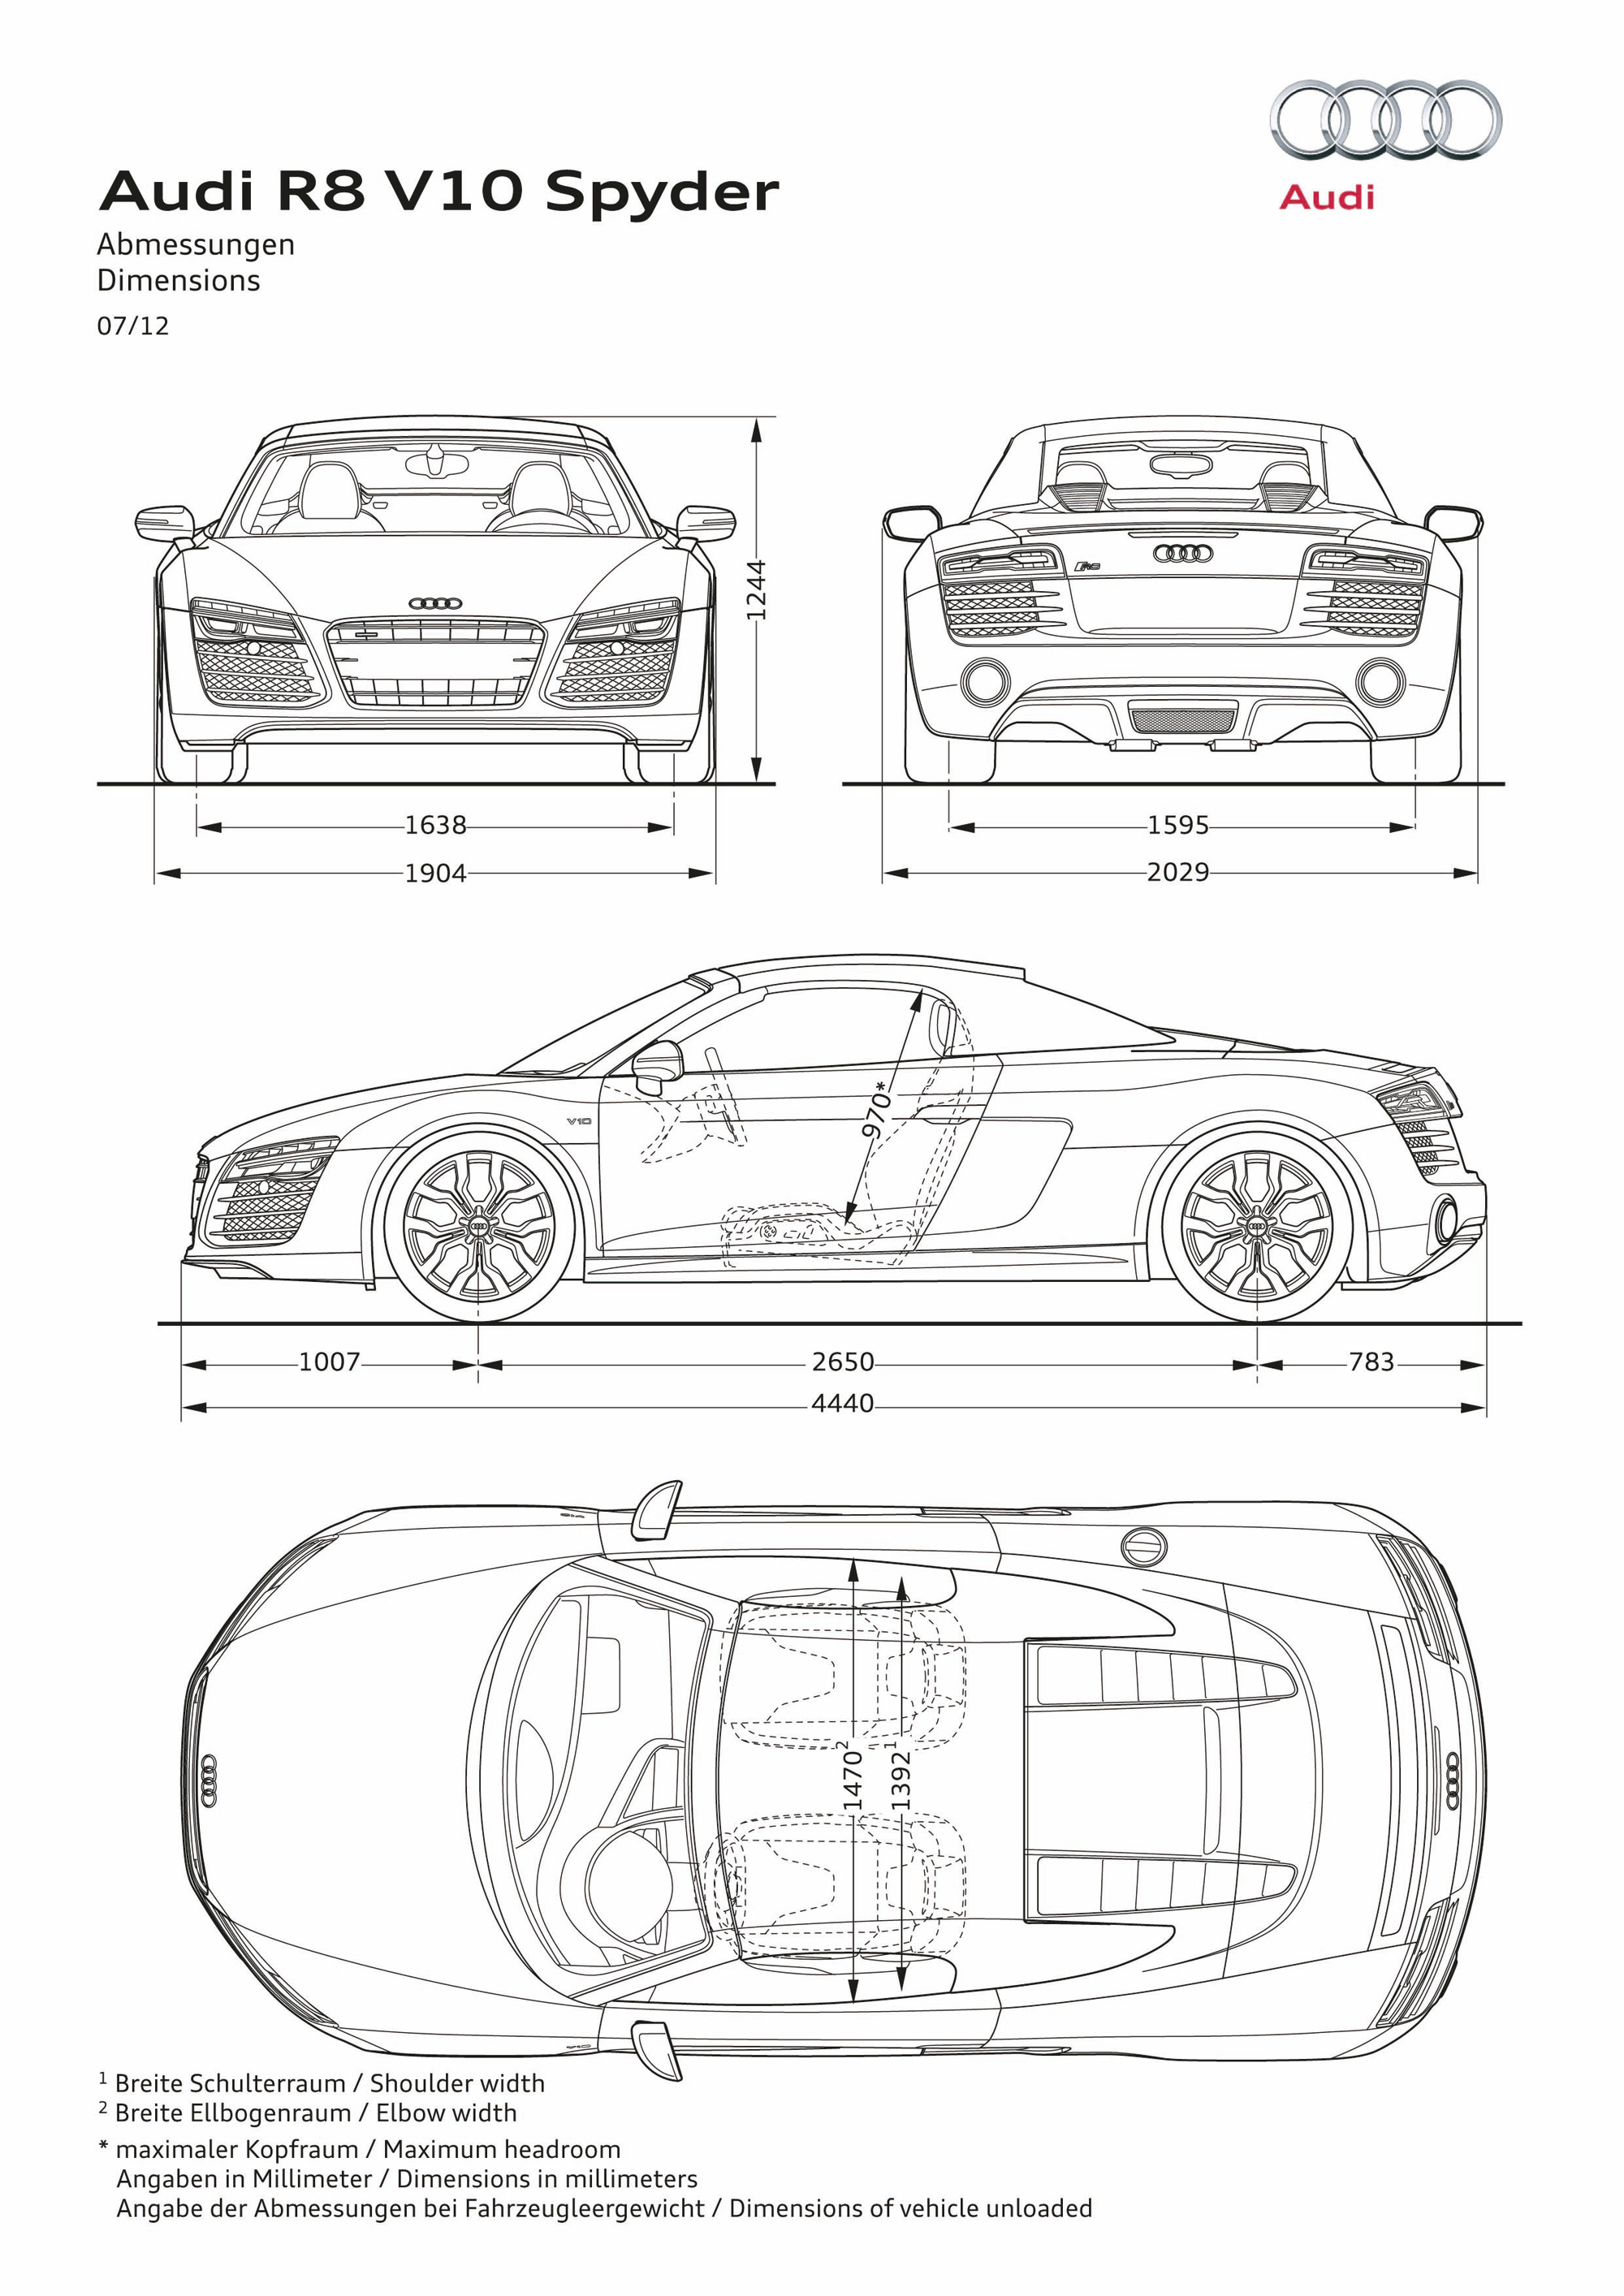 Ausmotive Audi R8 Facelift Revealed